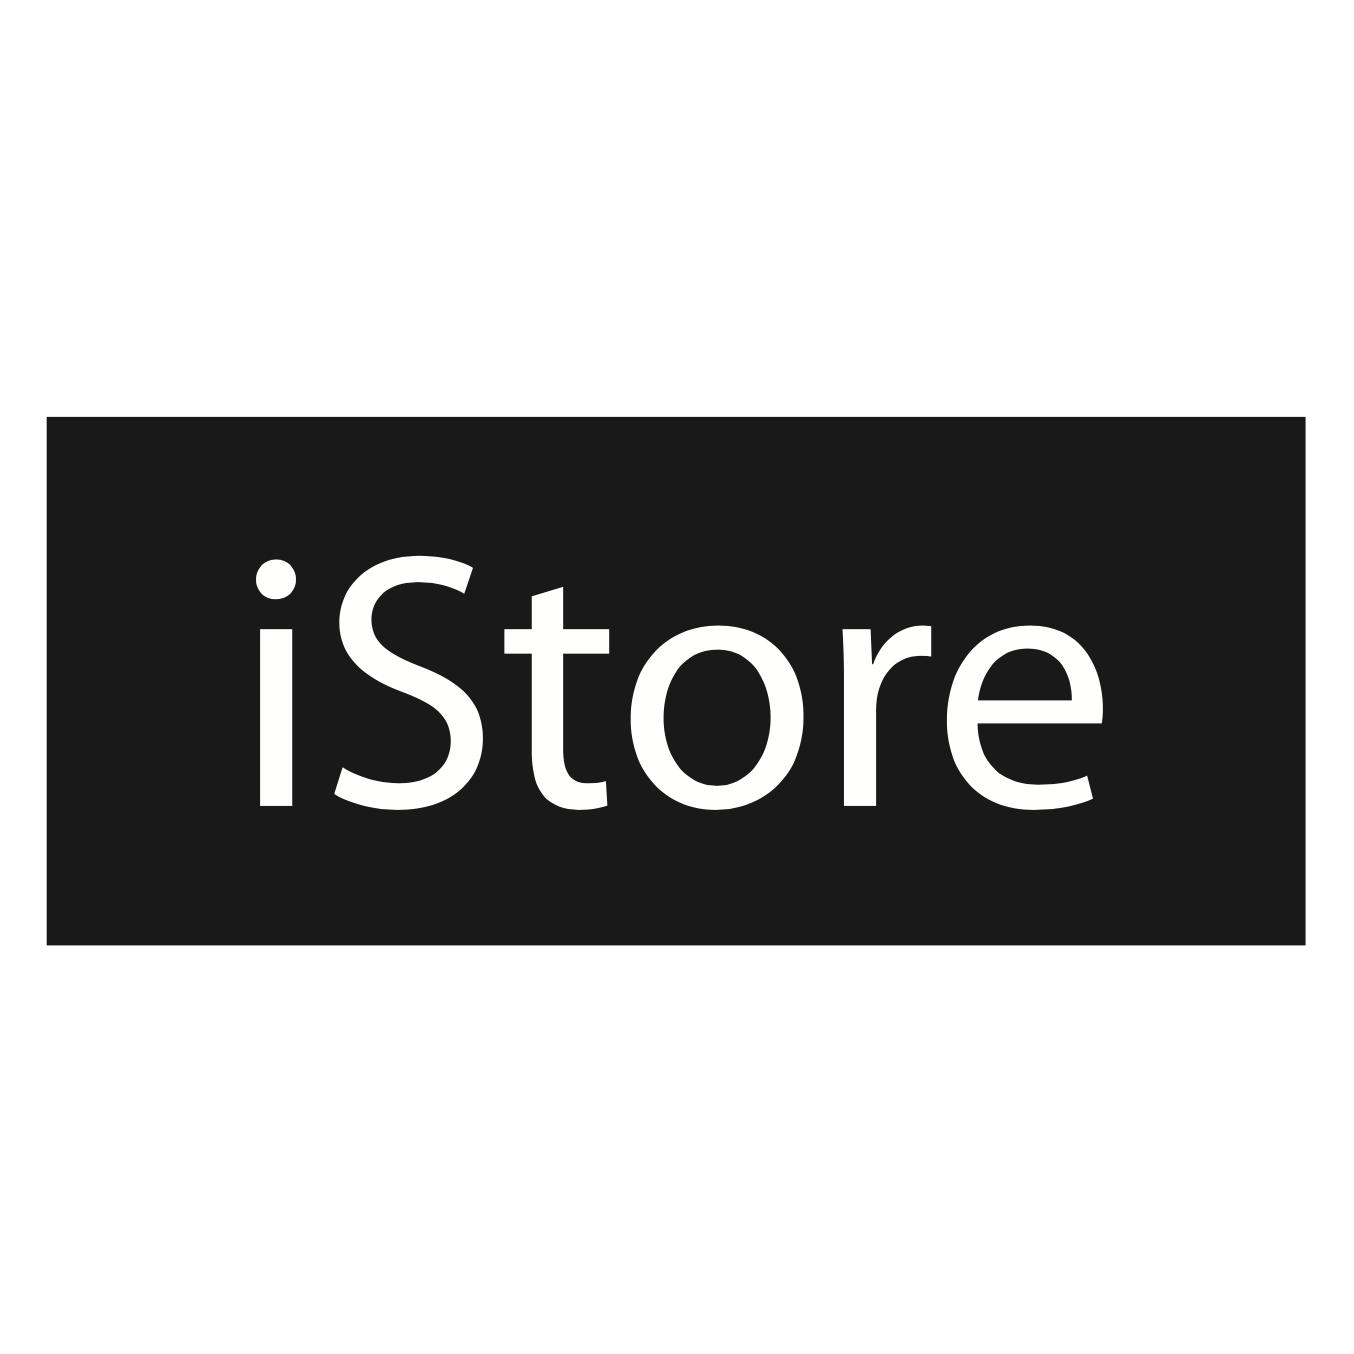 iPhone Xs Max 512GB - Space Grey